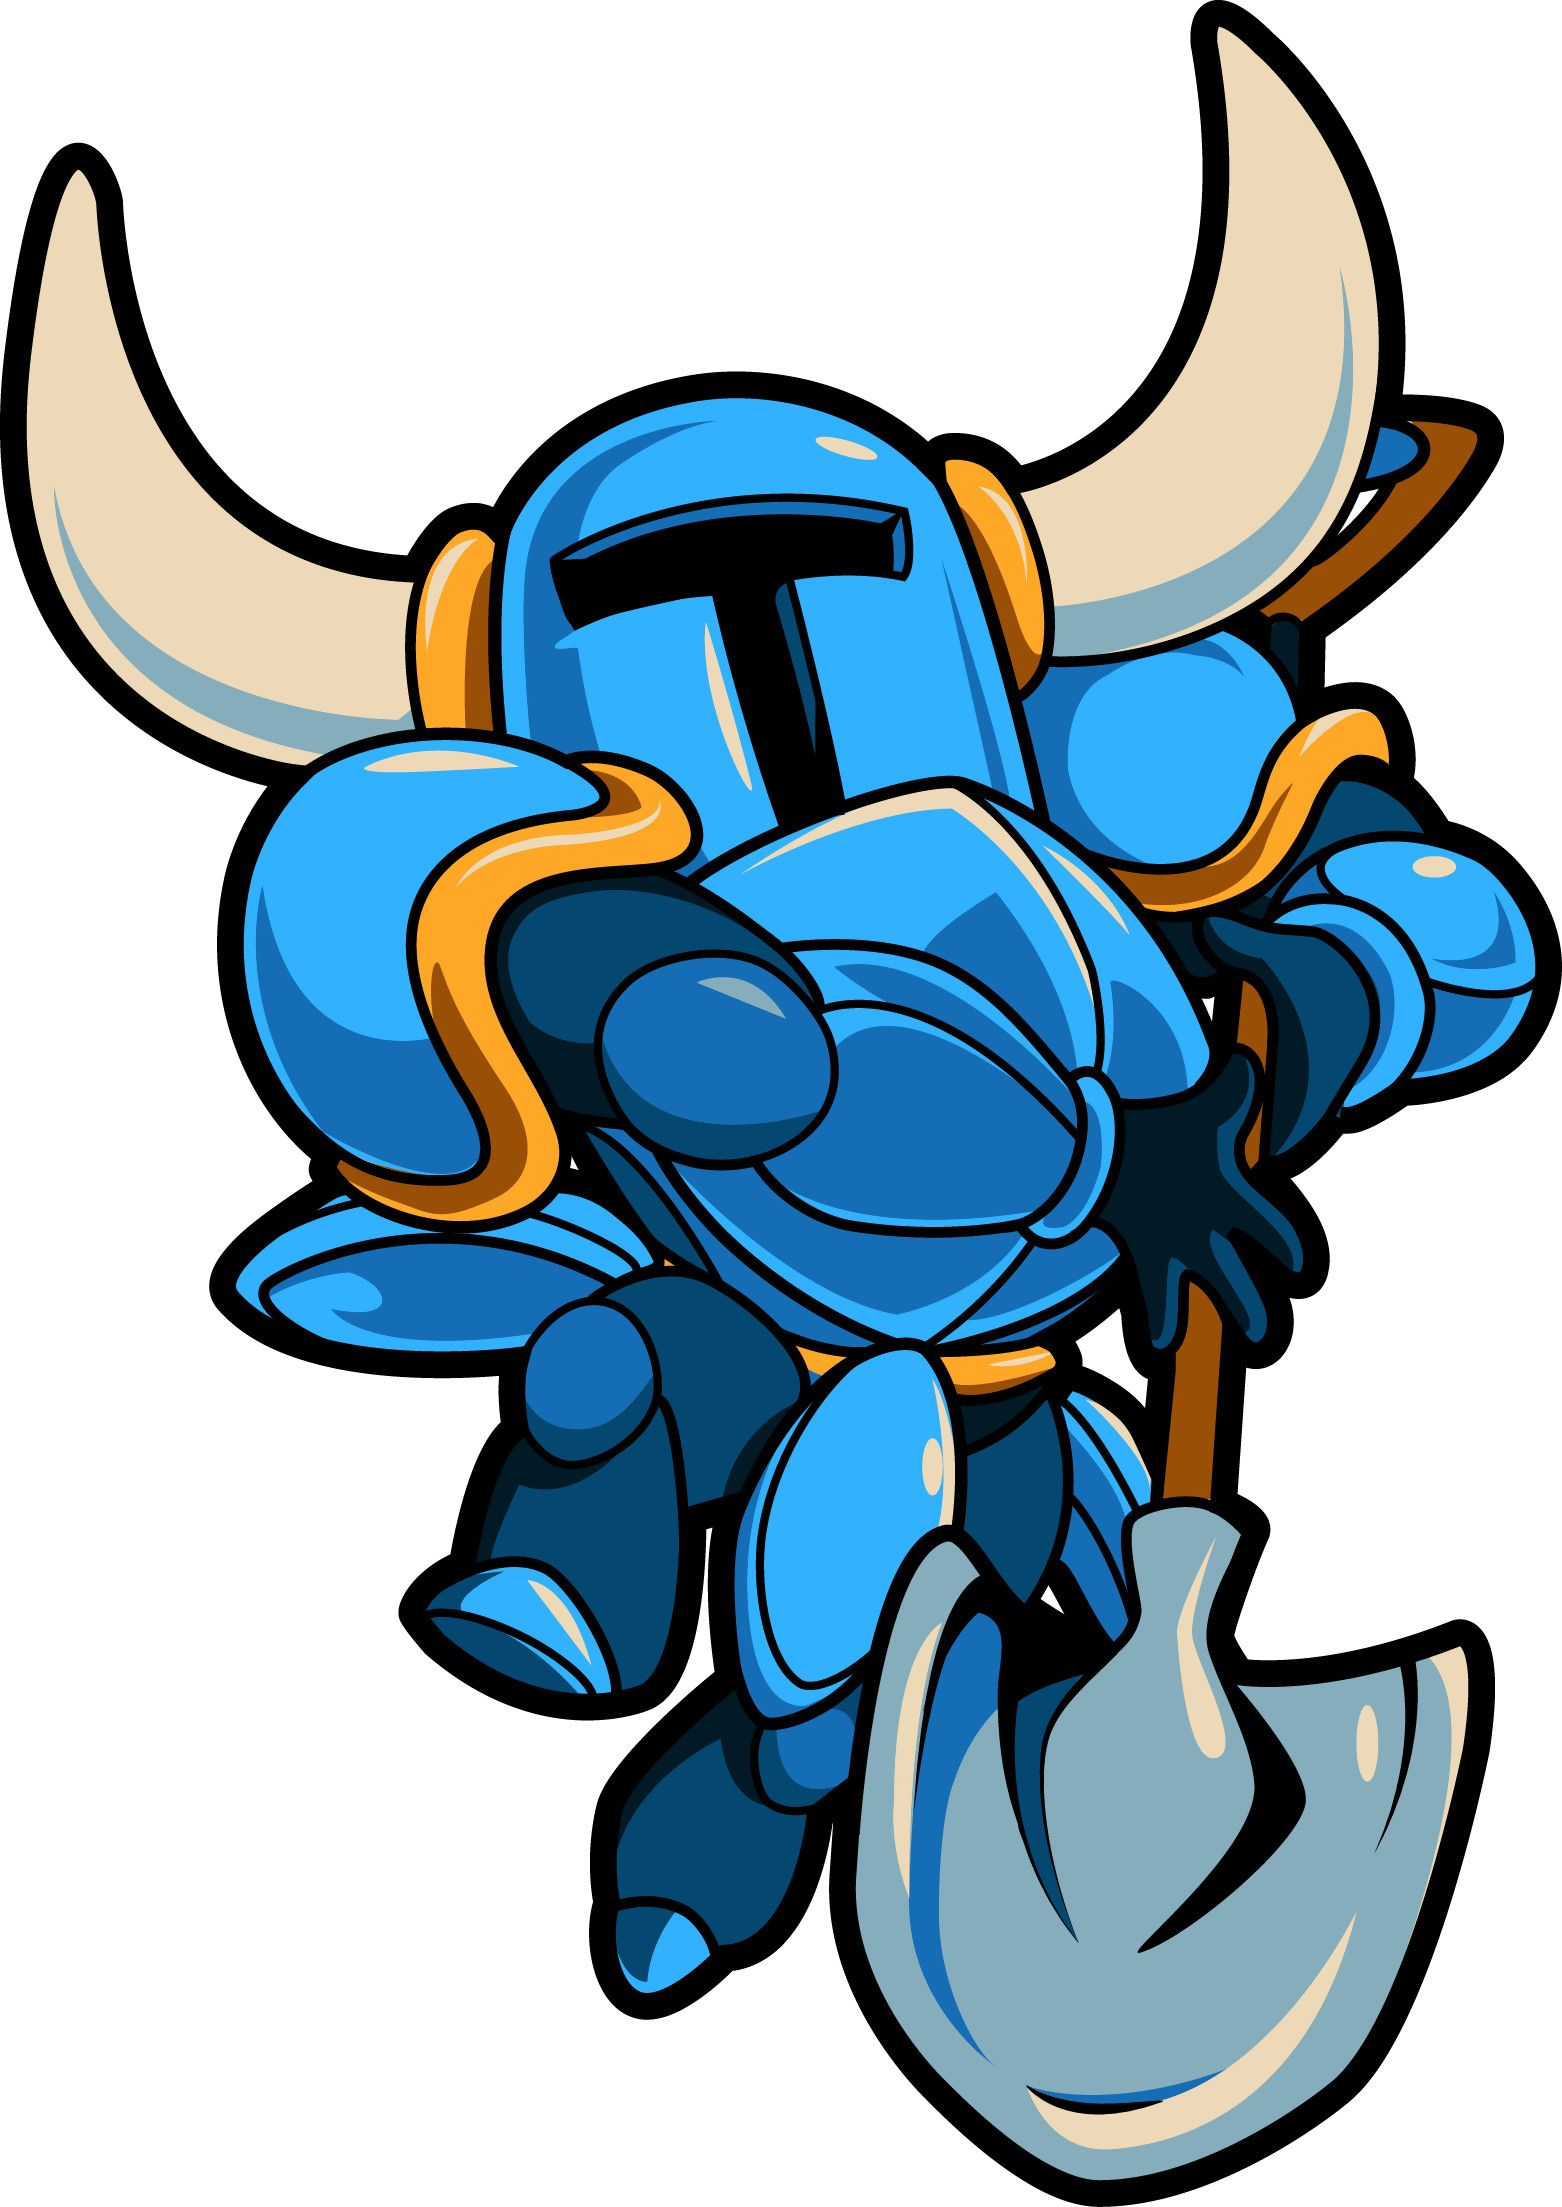 shovel knight.